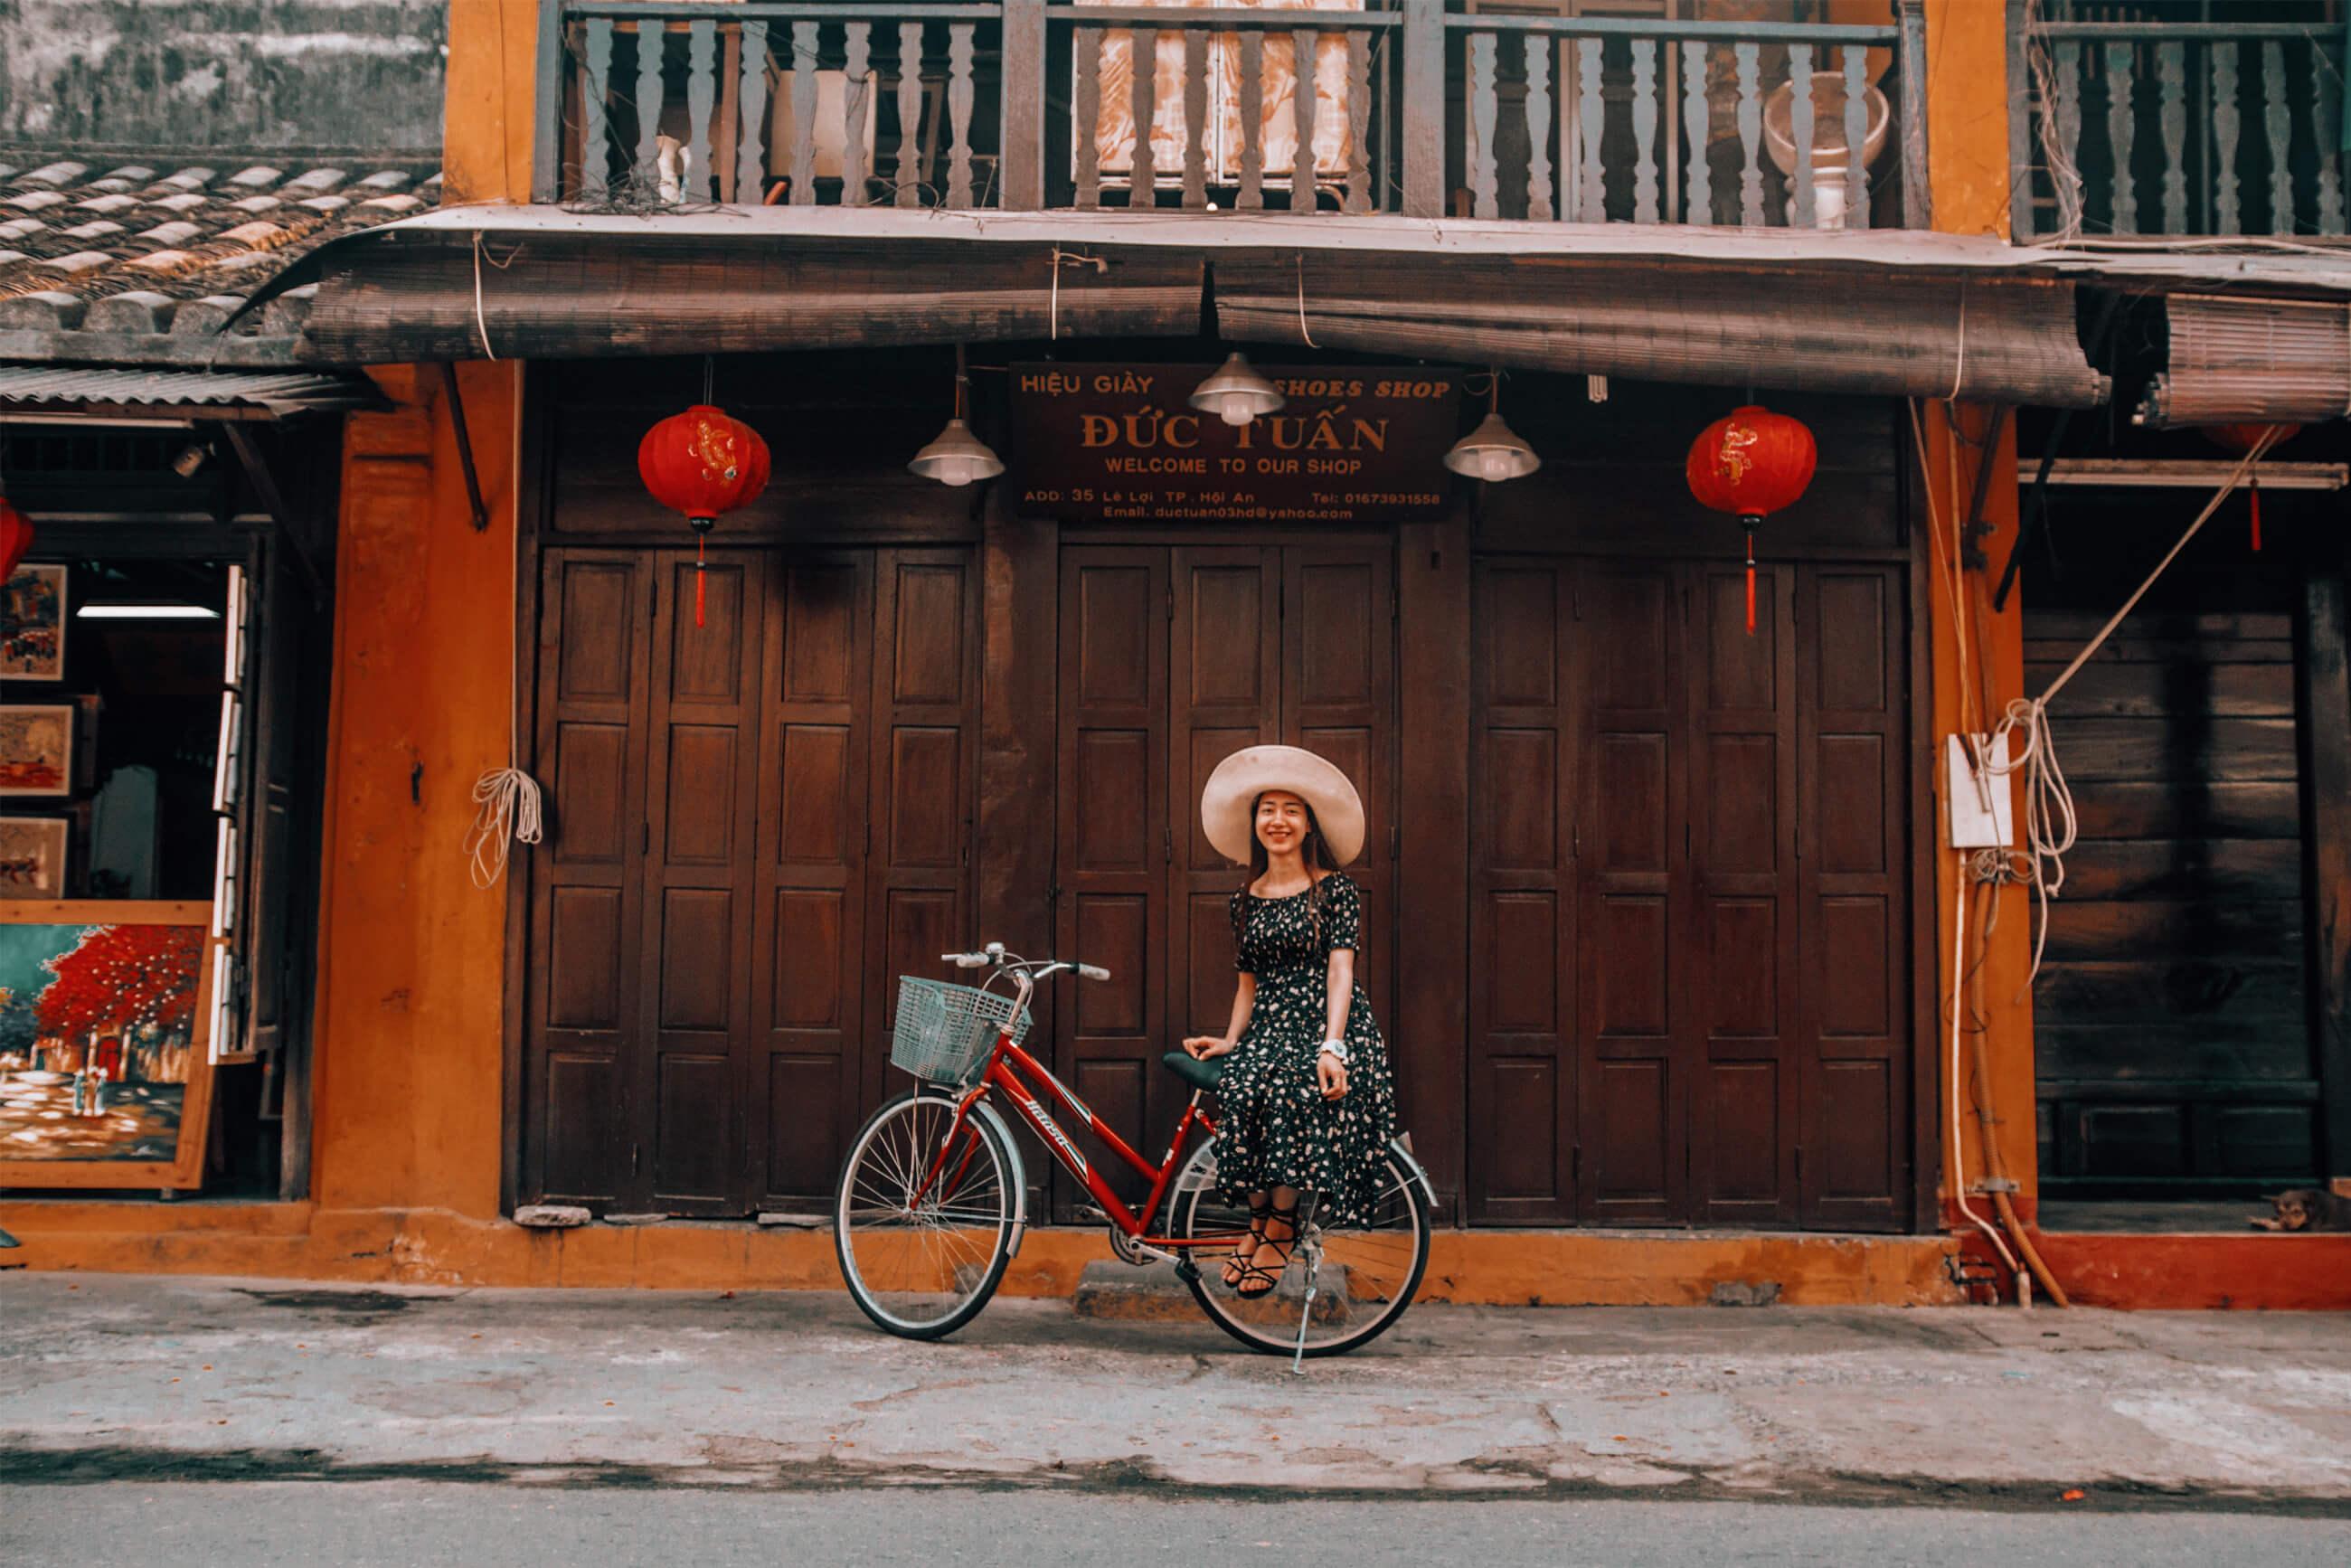 https://bubo.sk/uploads/galleries/7454/wweru__zuzkahabekova_vietnam_hoian.jpg